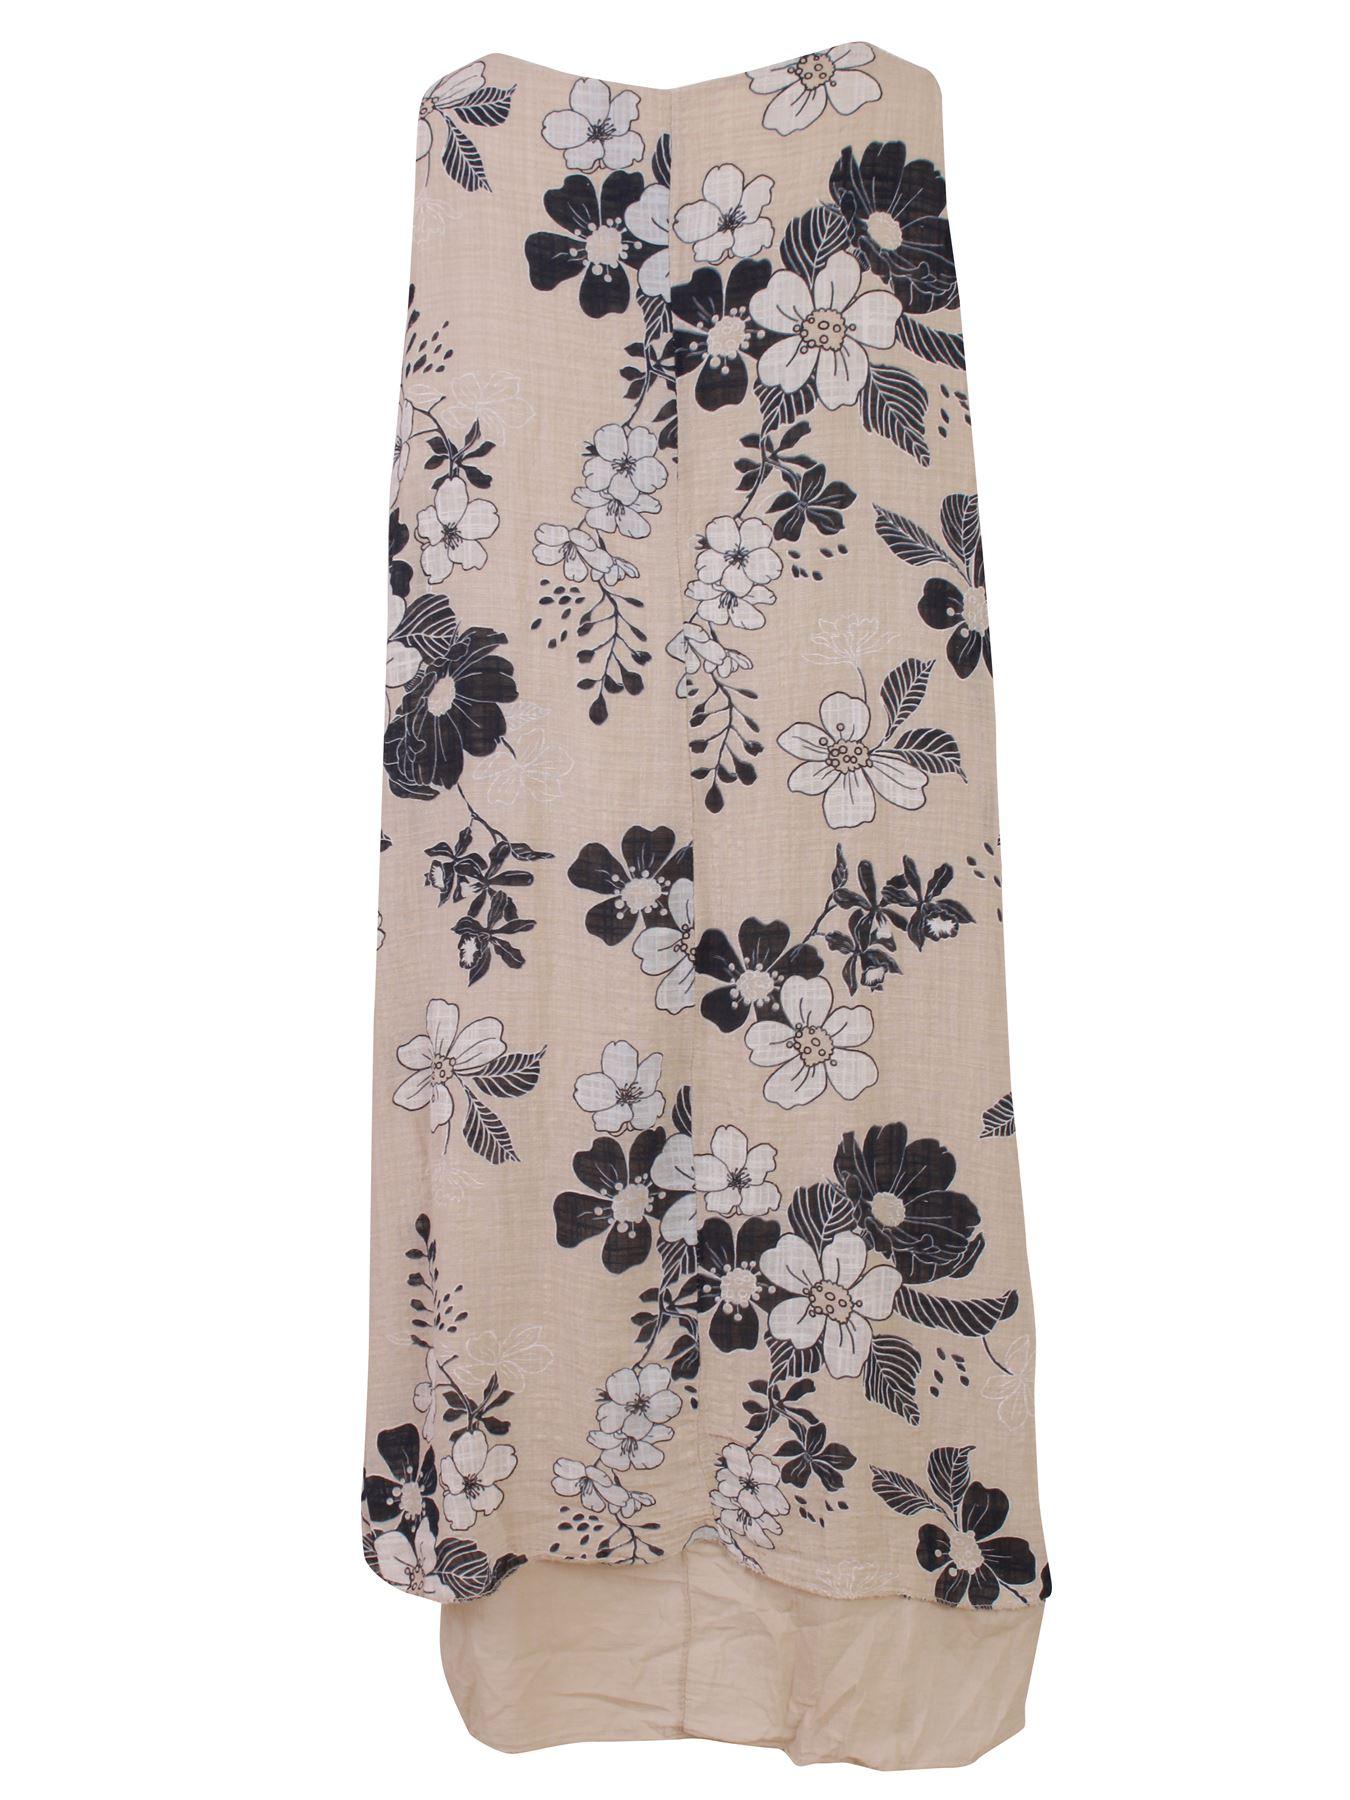 Womens-Floral-Print-Italian-Fashion-Lagenlook-Summer-Cotton-Crew-Neck-Dress thumbnail 9